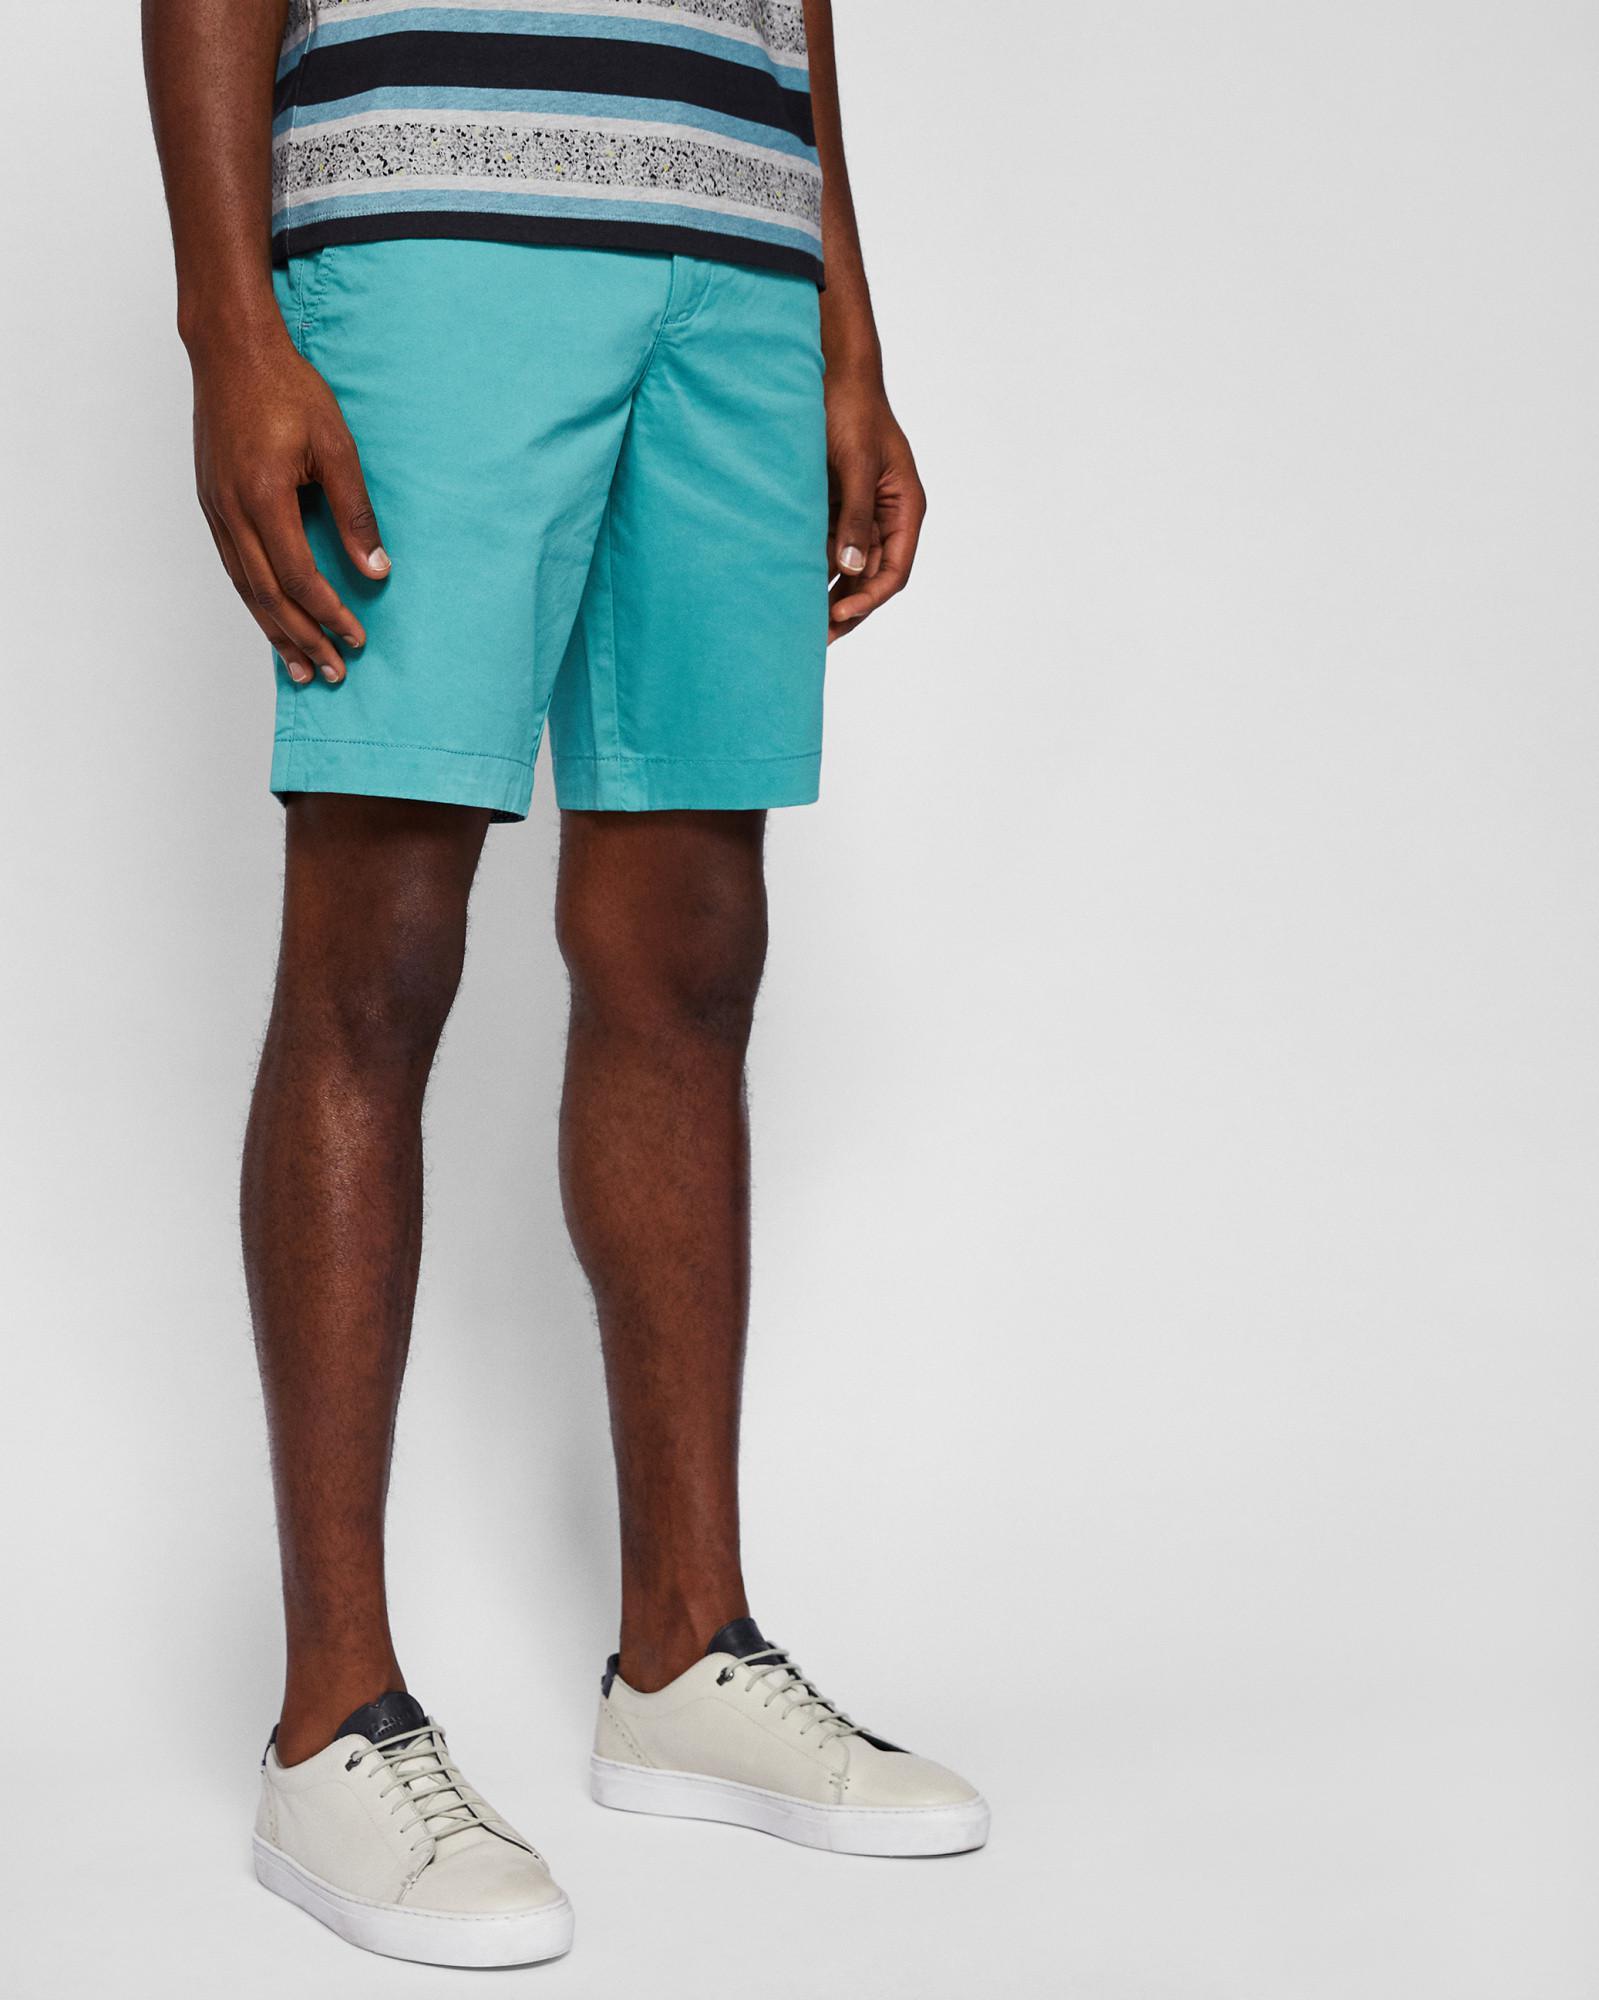 Slim Chino Shorts In Aqua - Pale green Ted Baker Whole World Shipping R6mKu